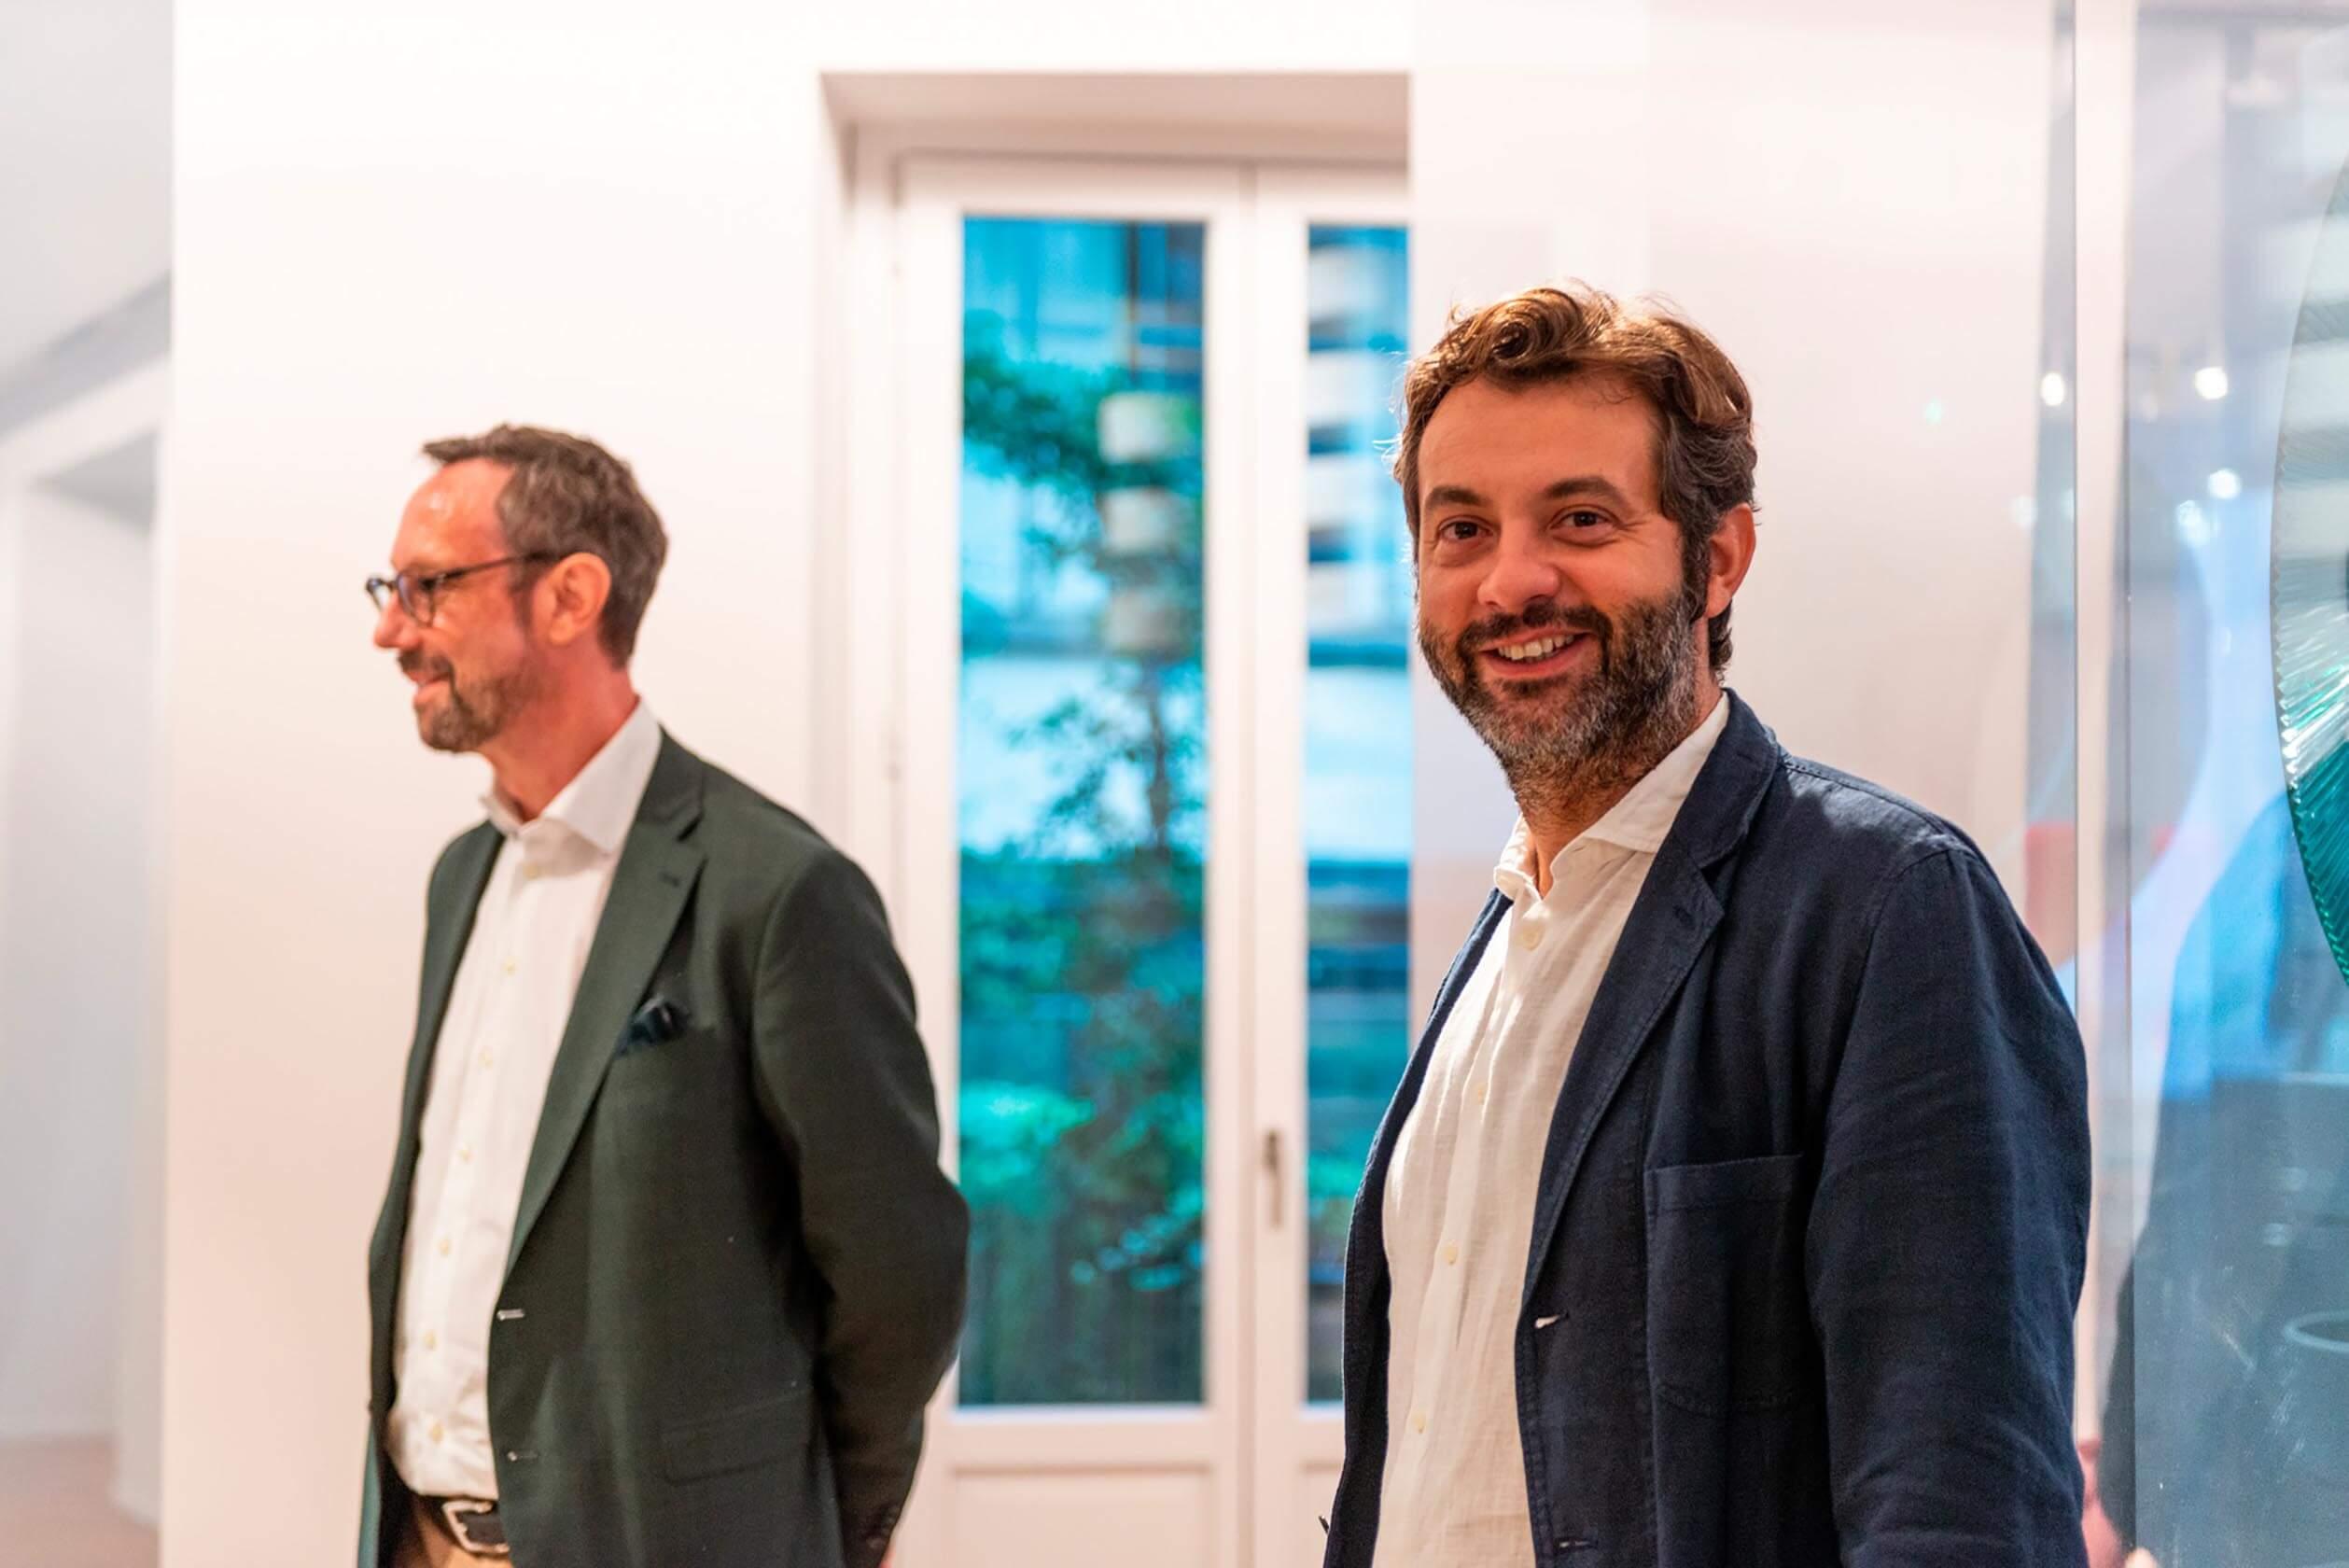 Roger Furrer and Matteo Fiorini standing in the Laufen space Milano exhibition.